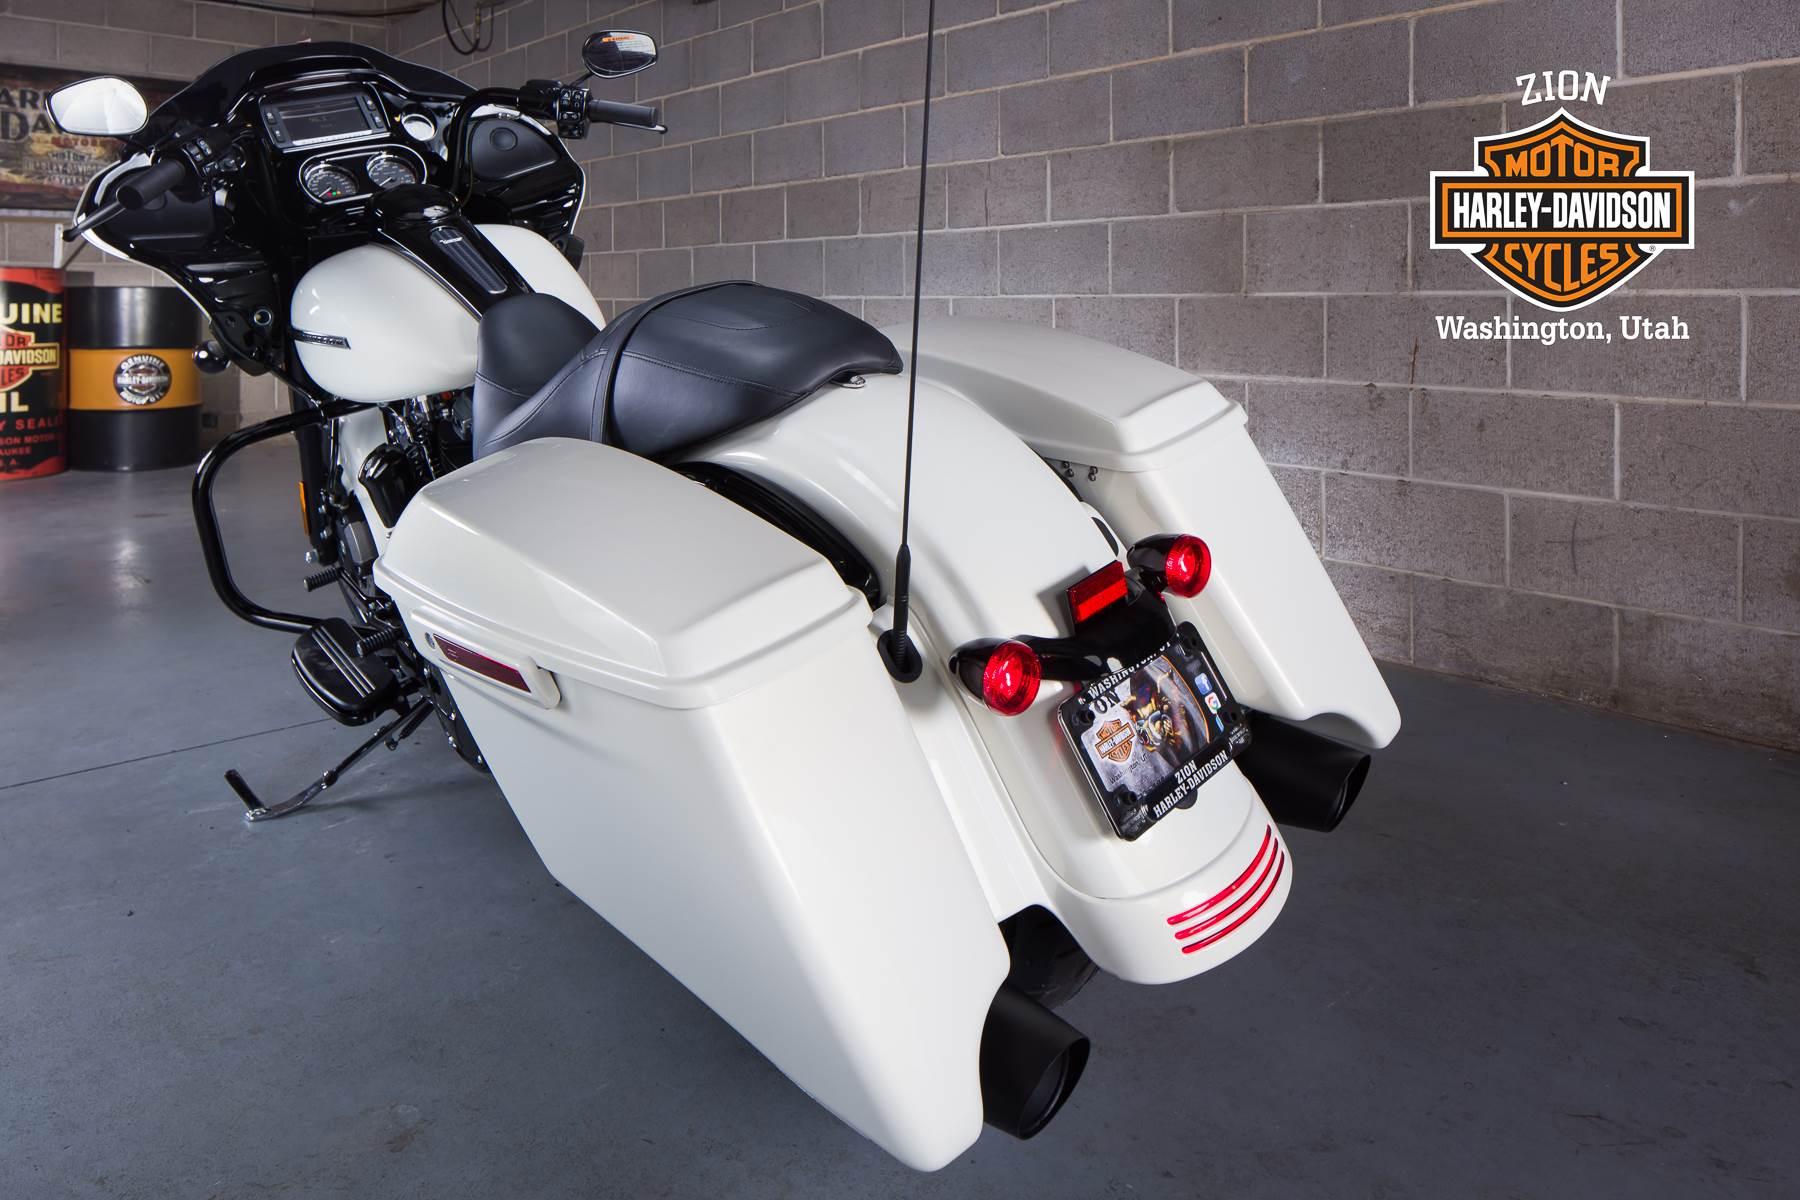 2018 Harley-Davidson Road Glide Special 8